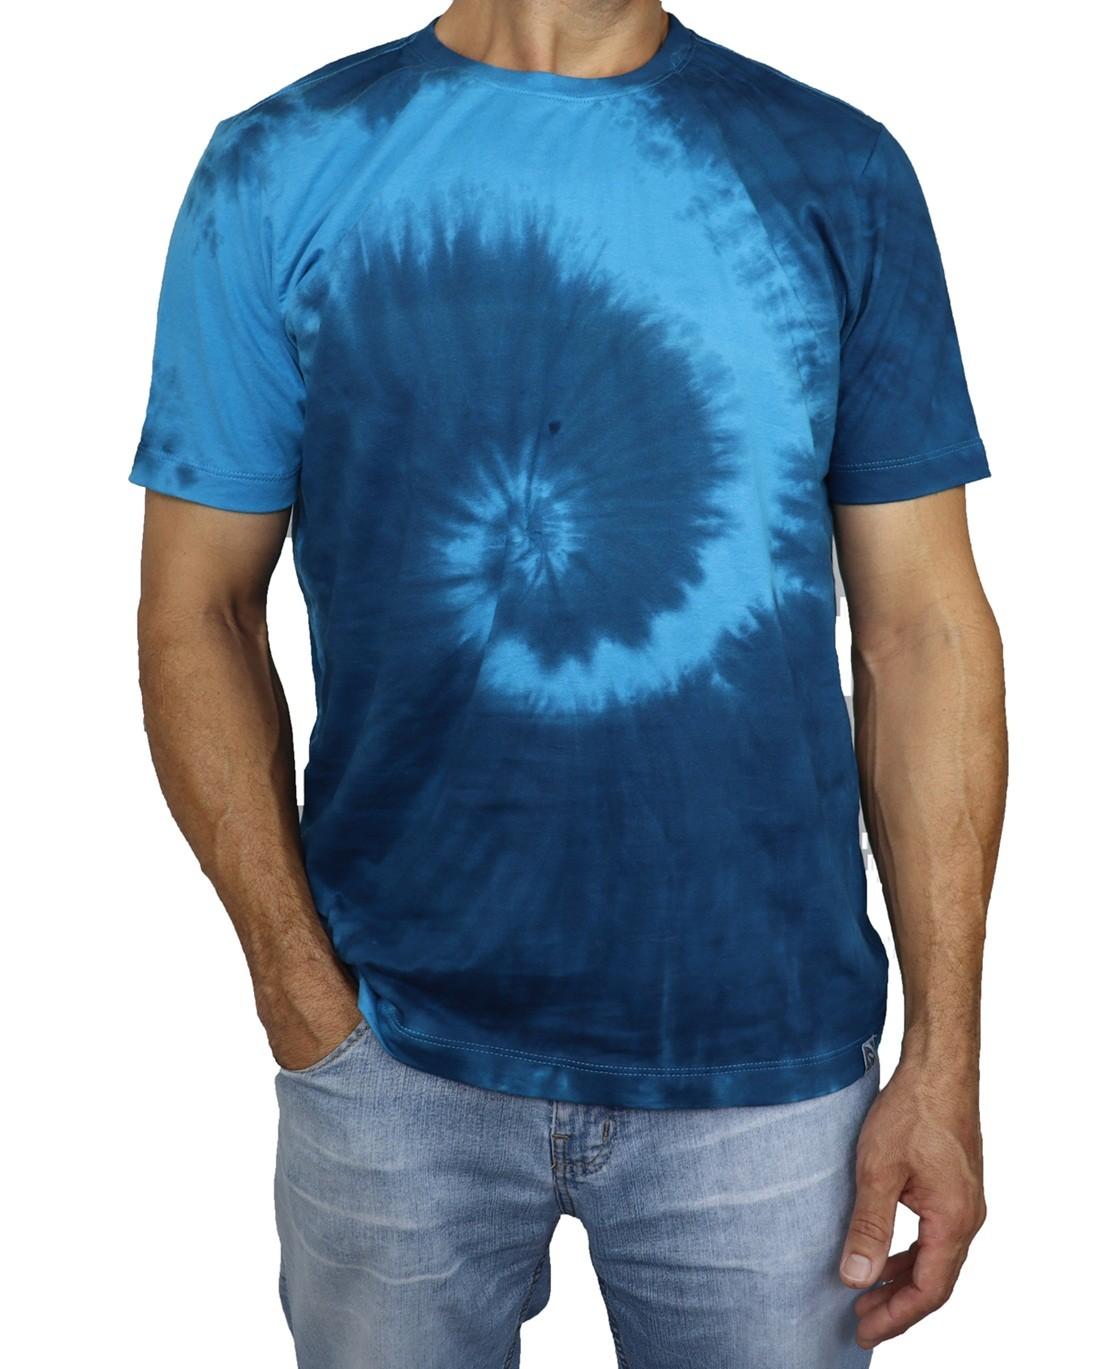 Camiseta Algodão Tie Dye Hippie Espiral  - HF | High Flight